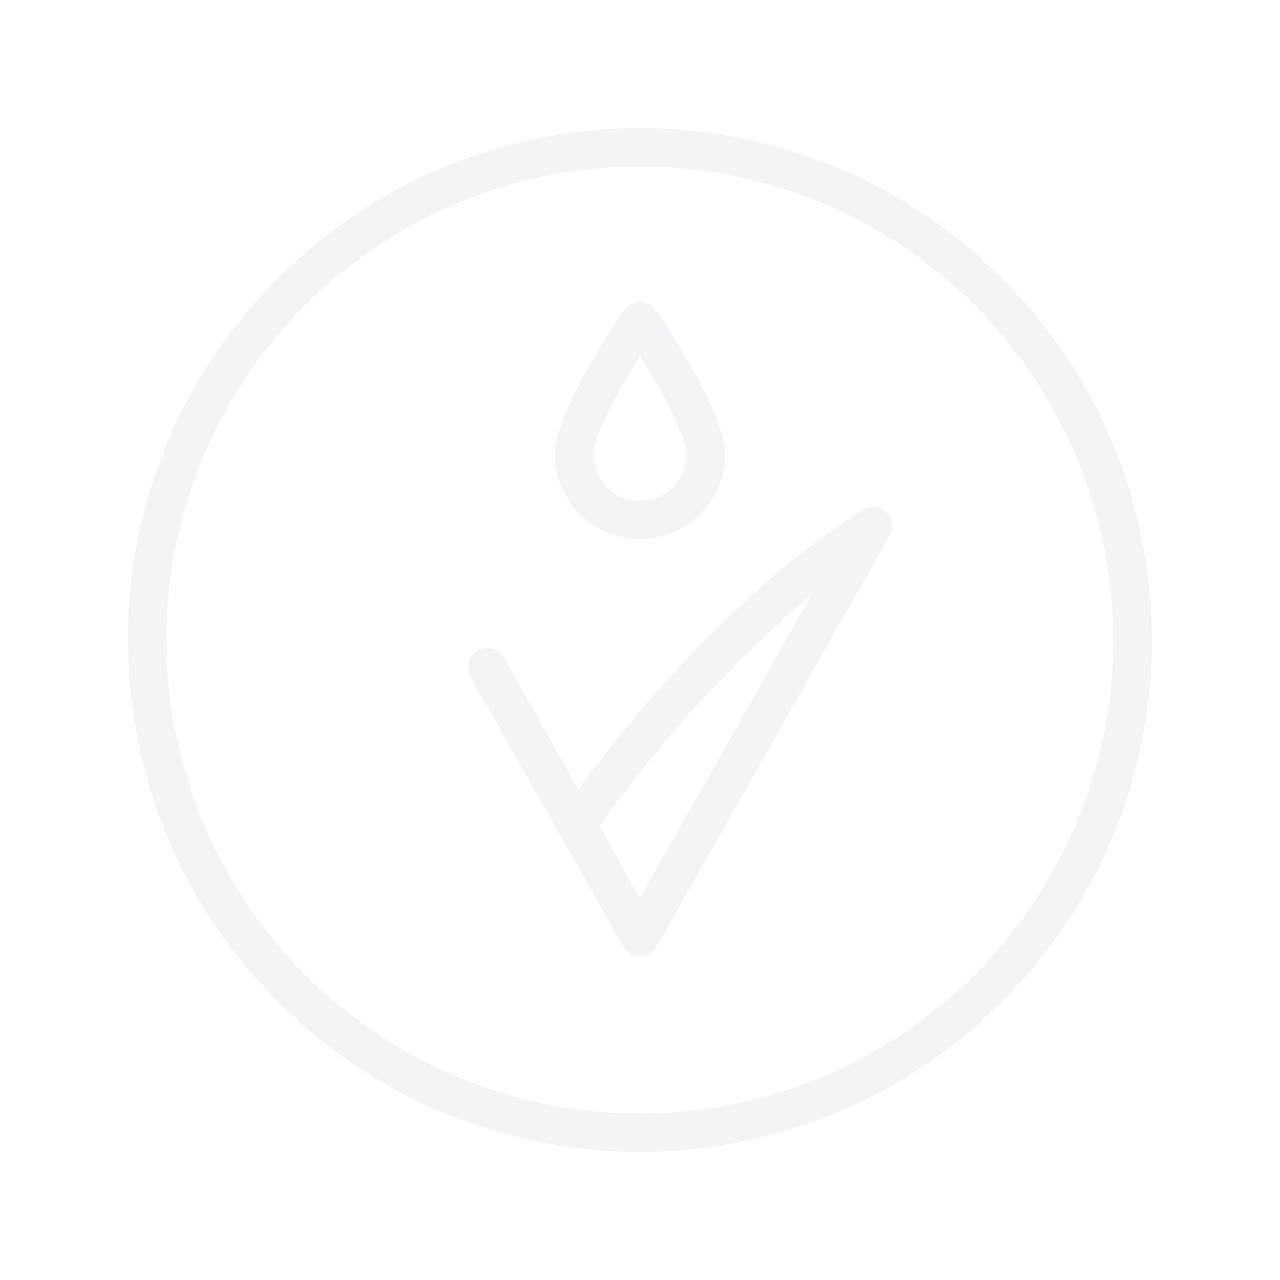 THE SKIN HOUSE White Wrinkle Mask 20g